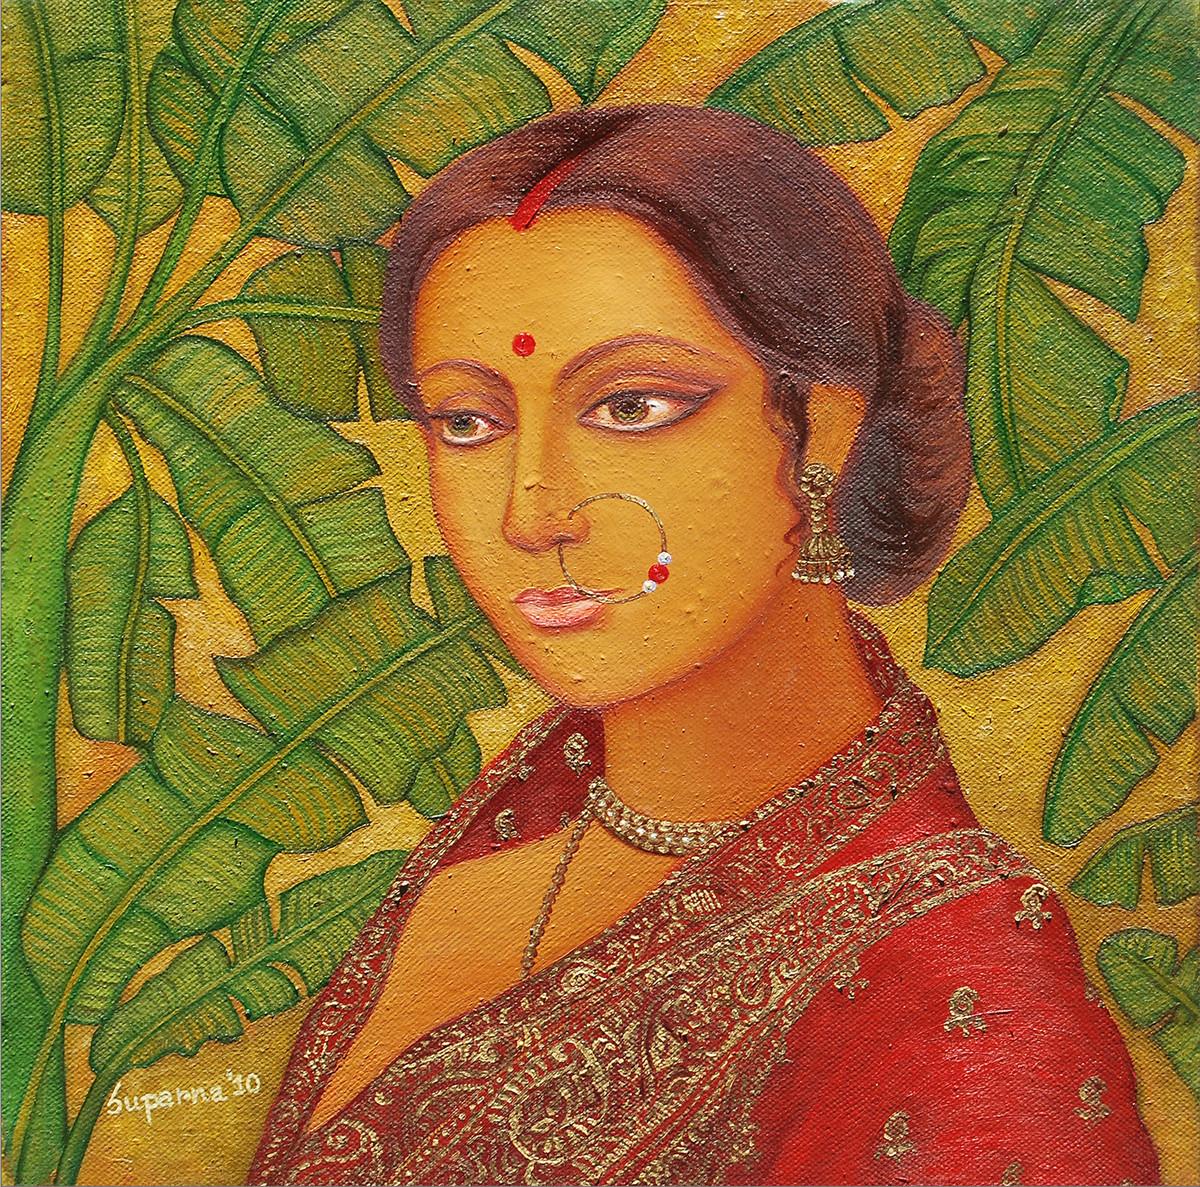 Bengali Bride IV by Suparna Dey, Realism Digital Art, Oil on Canvas, Green color